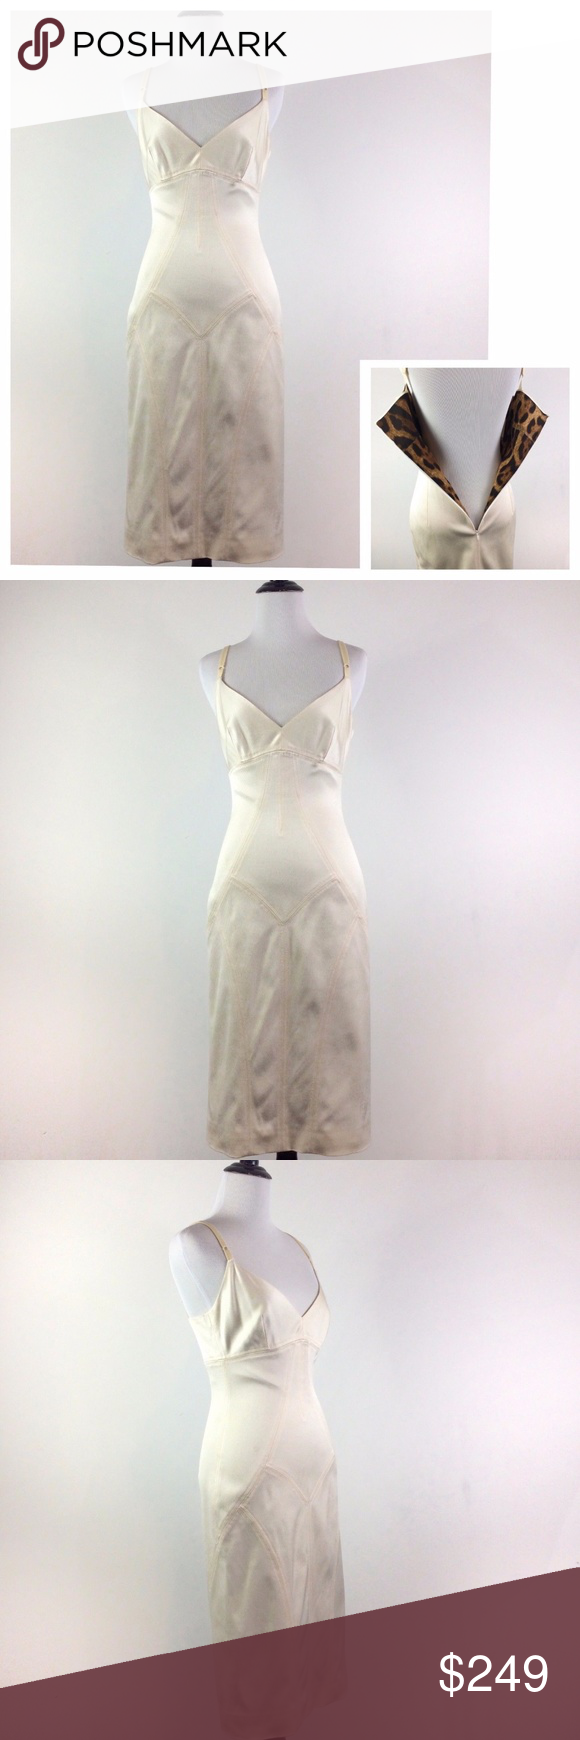 Sold Dolce Gabbana Cream Stretchy Bodycon Dress Stretchy Bodycon Dress Dresses Dolce And Gabbana [ 1740 x 580 Pixel ]